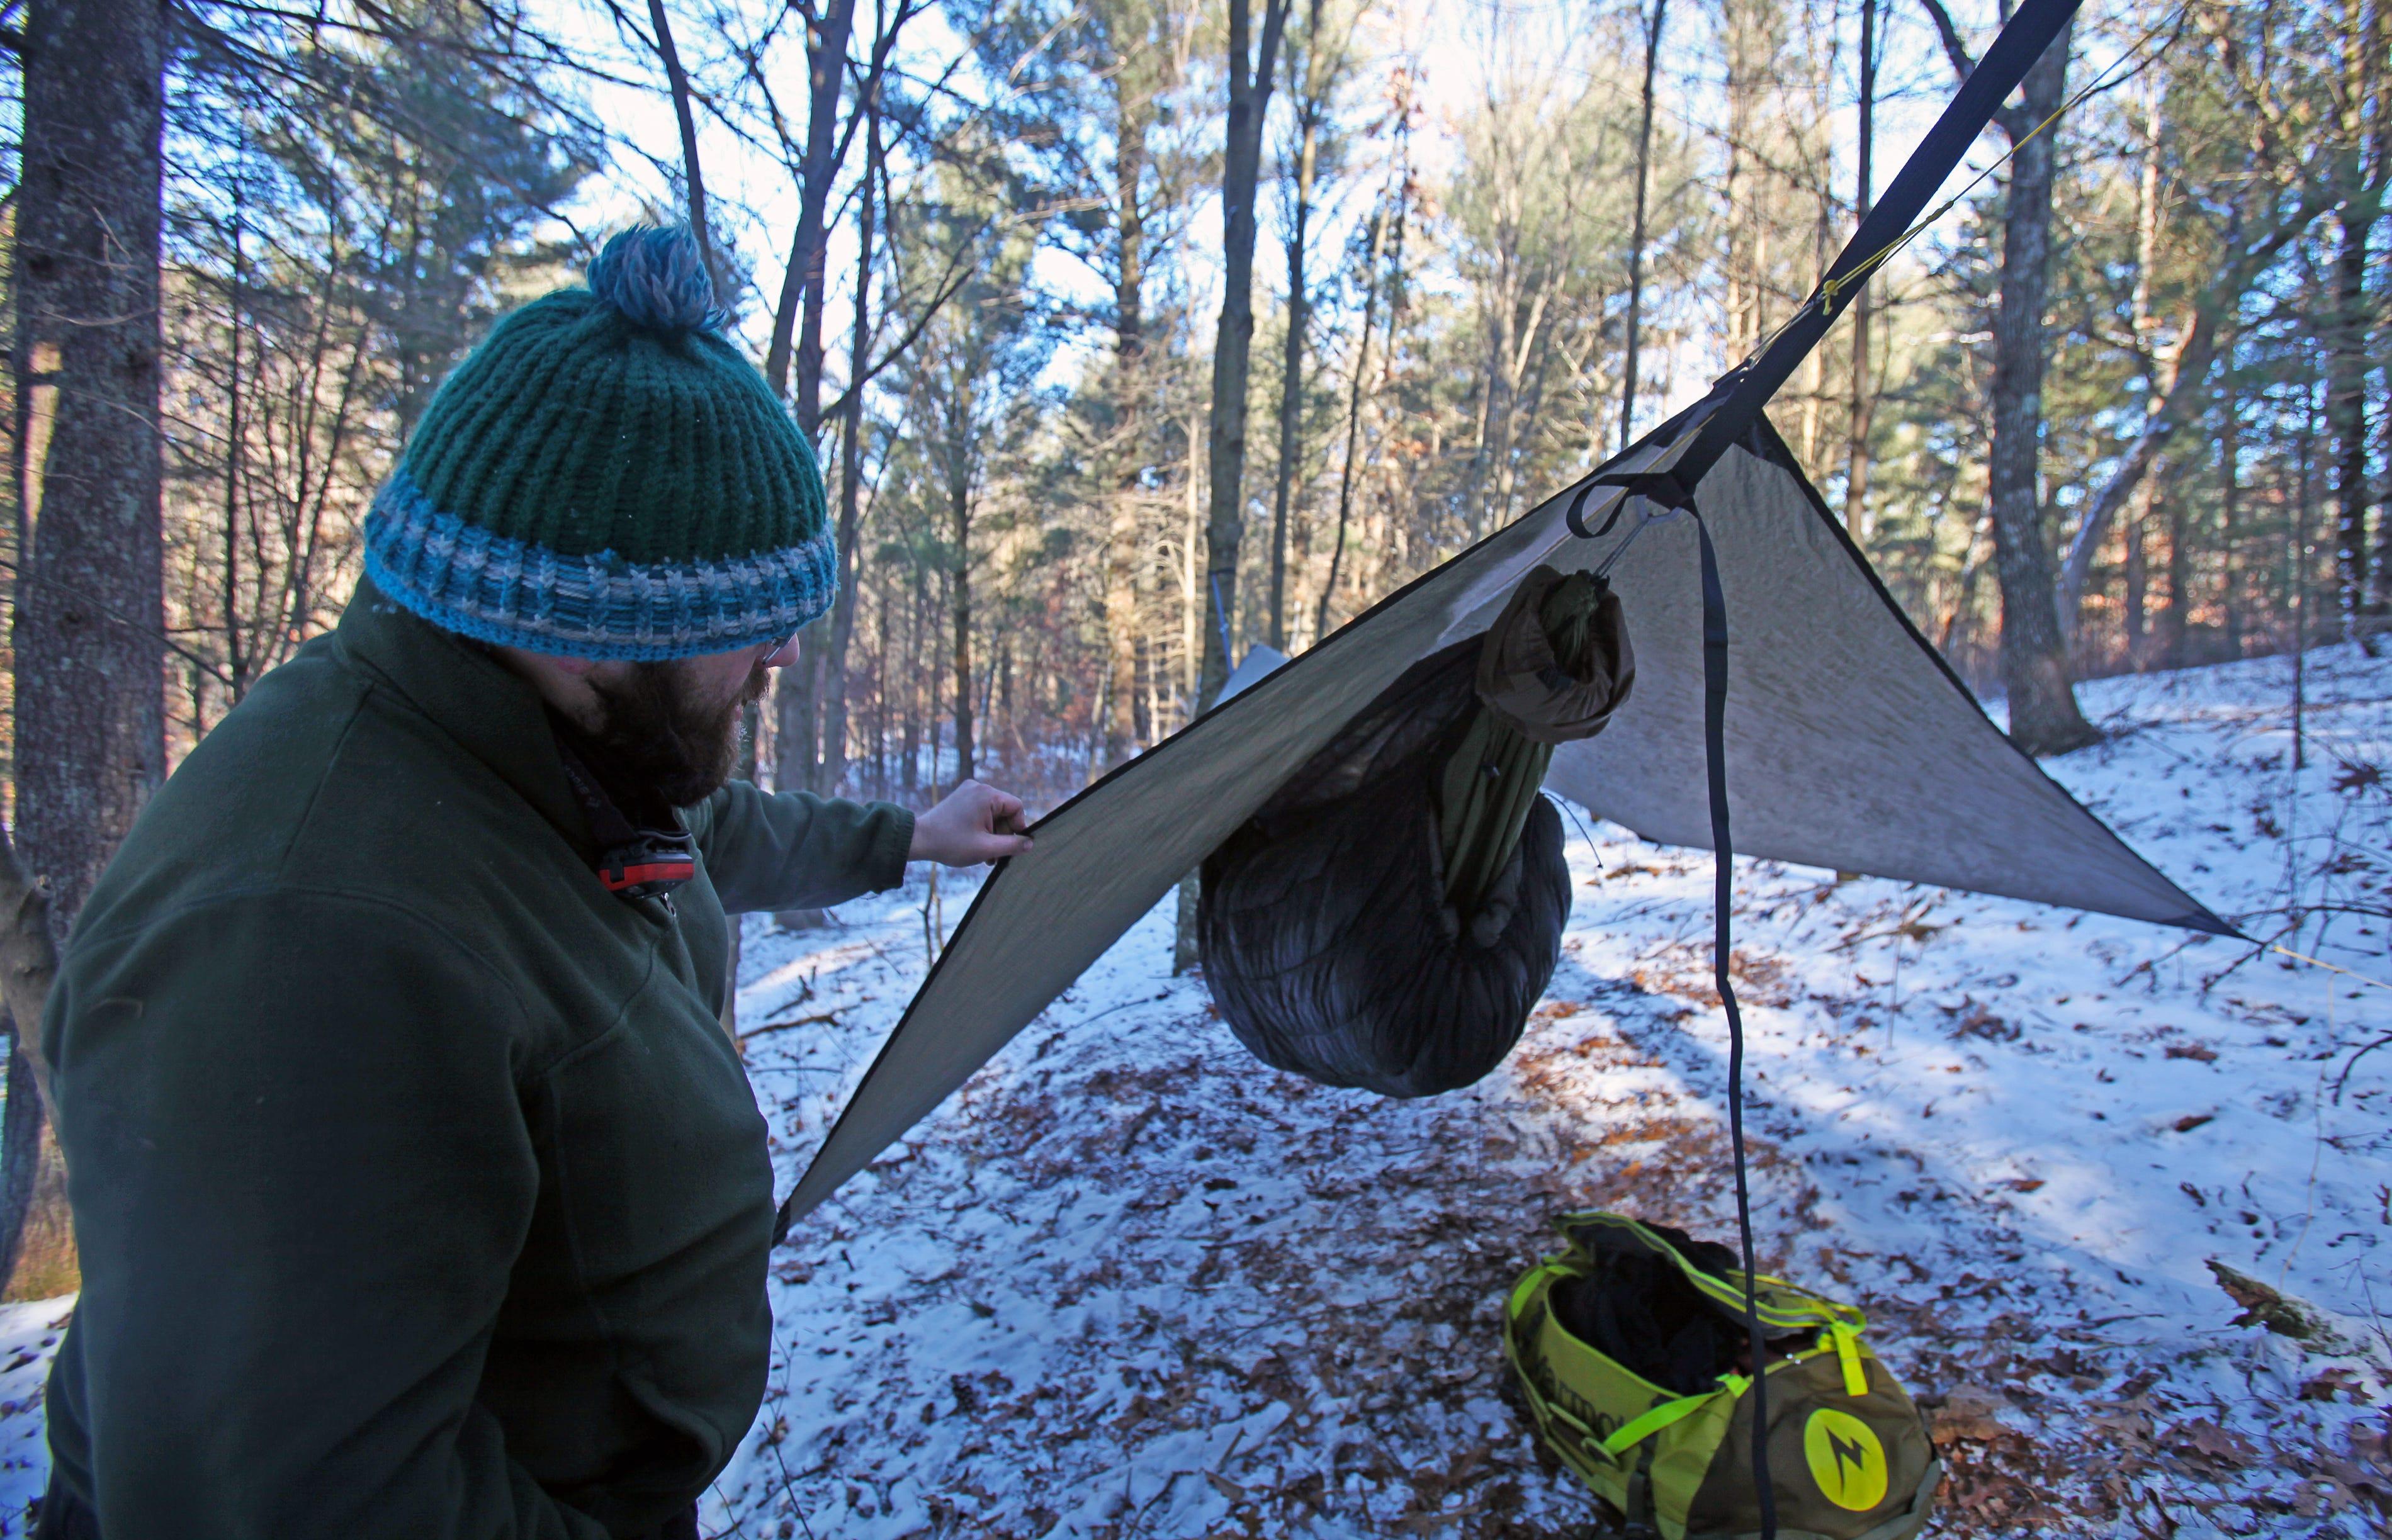 frozen butt hang winter hammock campers gather for wisconsin u0027s frozen butt hang  rh   jsonline